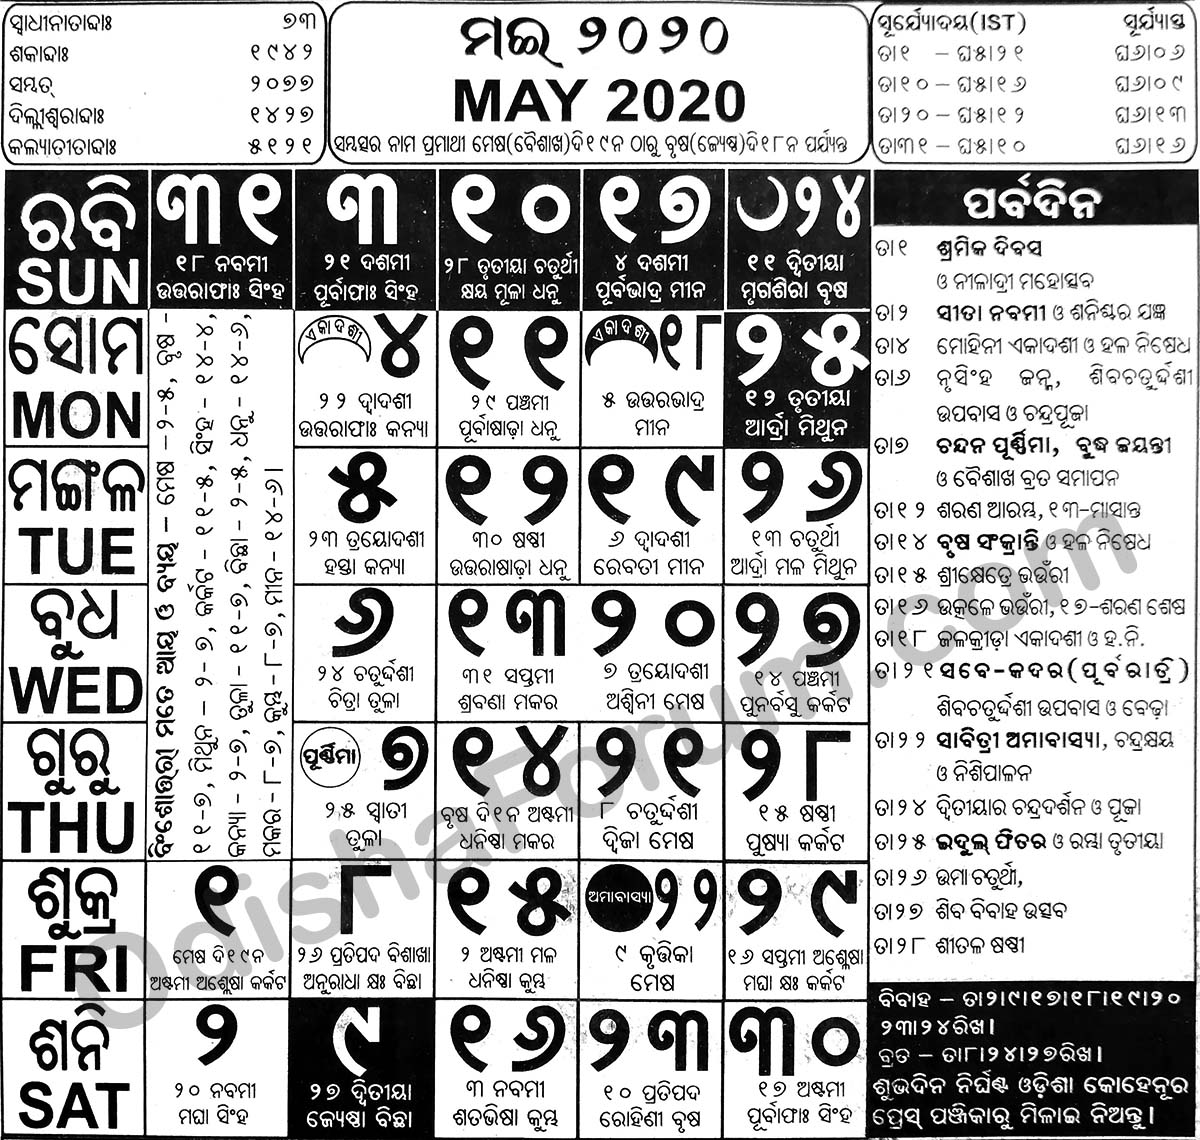 2020 May Oriya Calendar